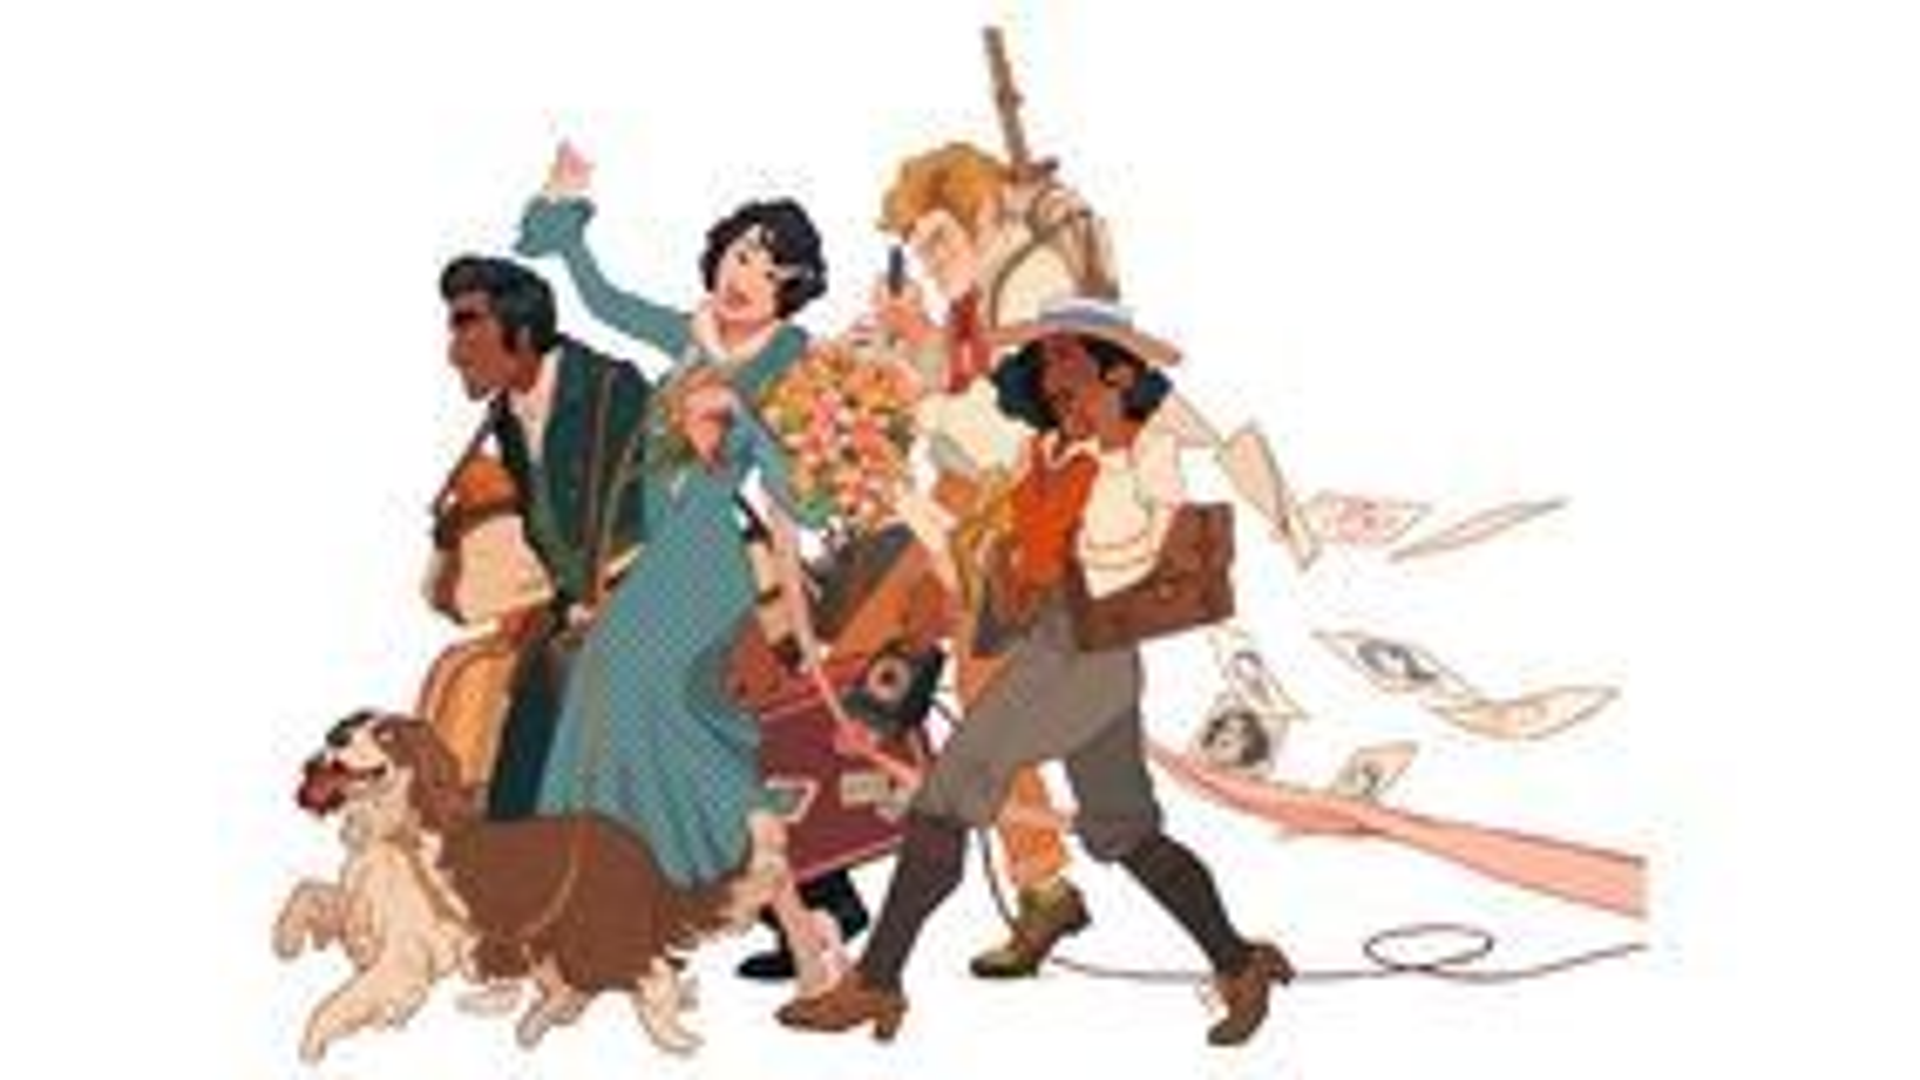 Flabbergasted RPG artwork 2